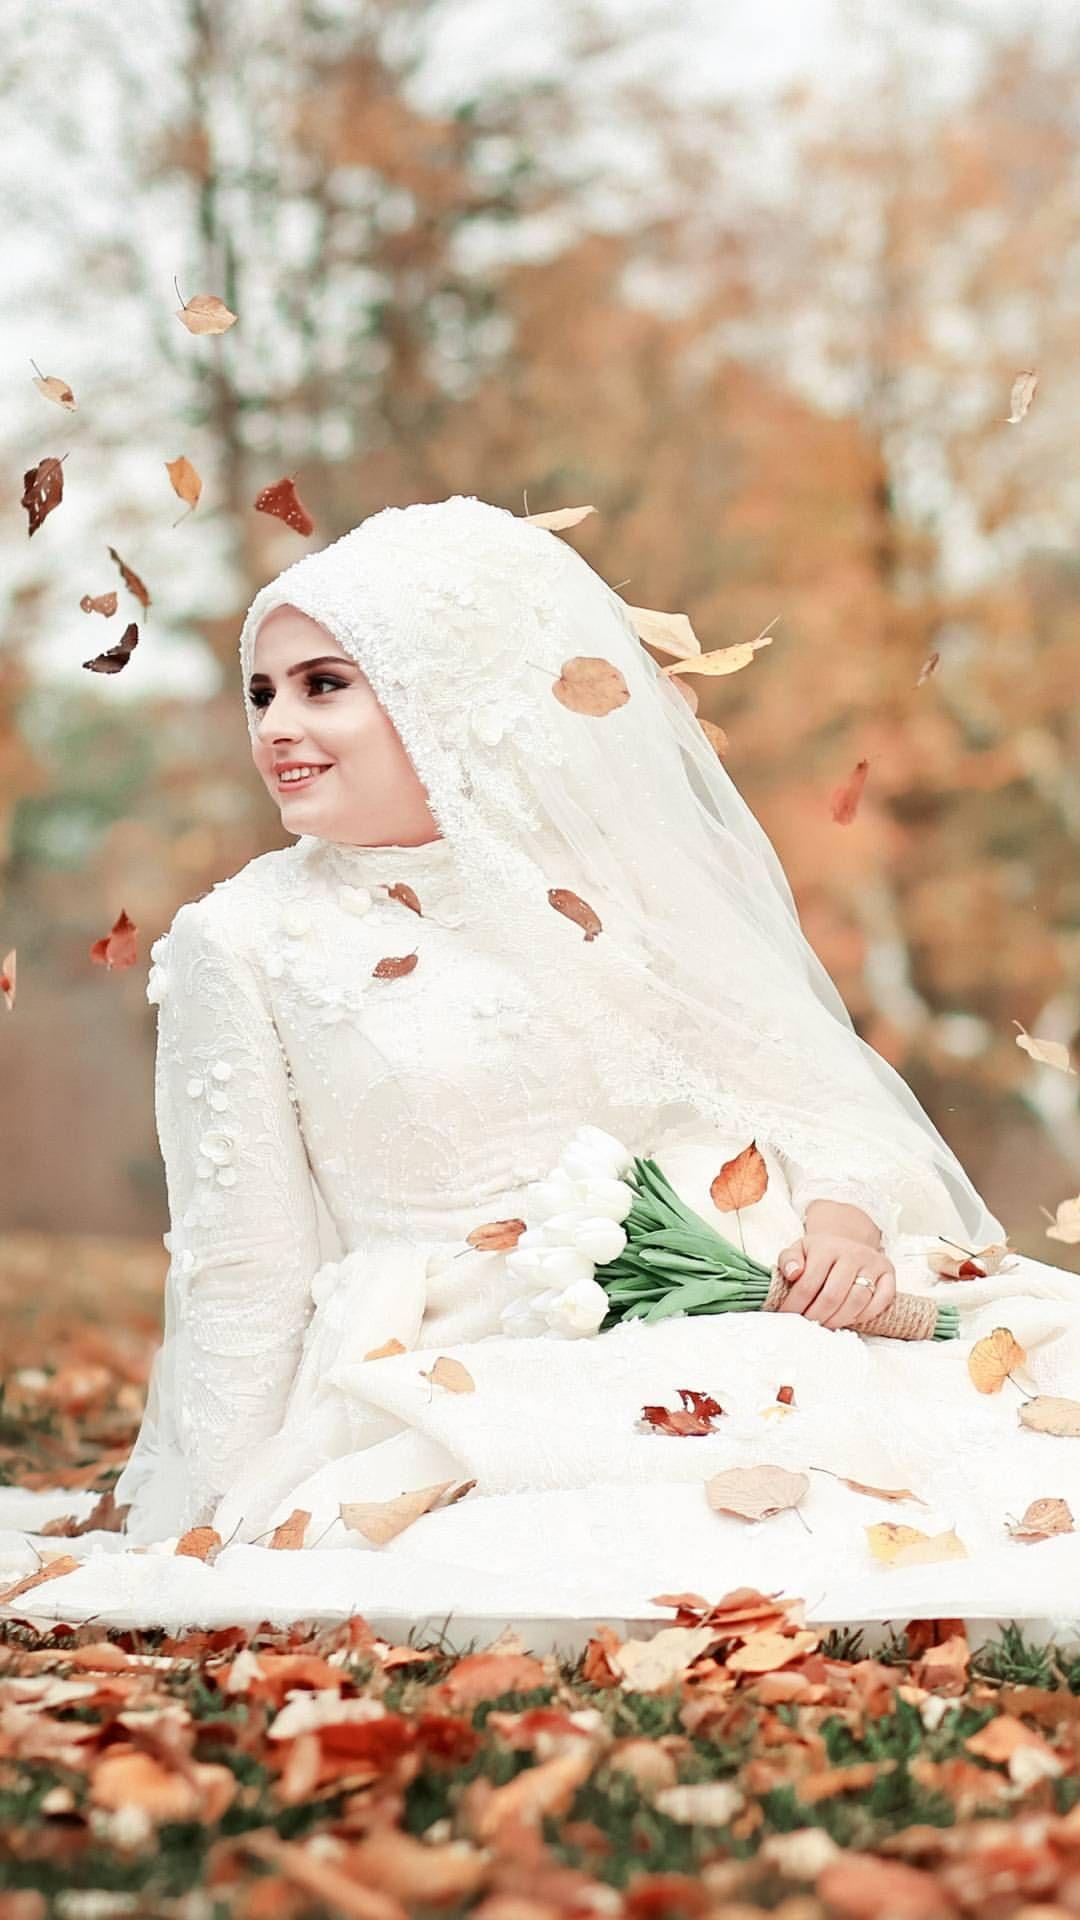 Pin by schoko werke on hijab pinterest wedding muslim brides